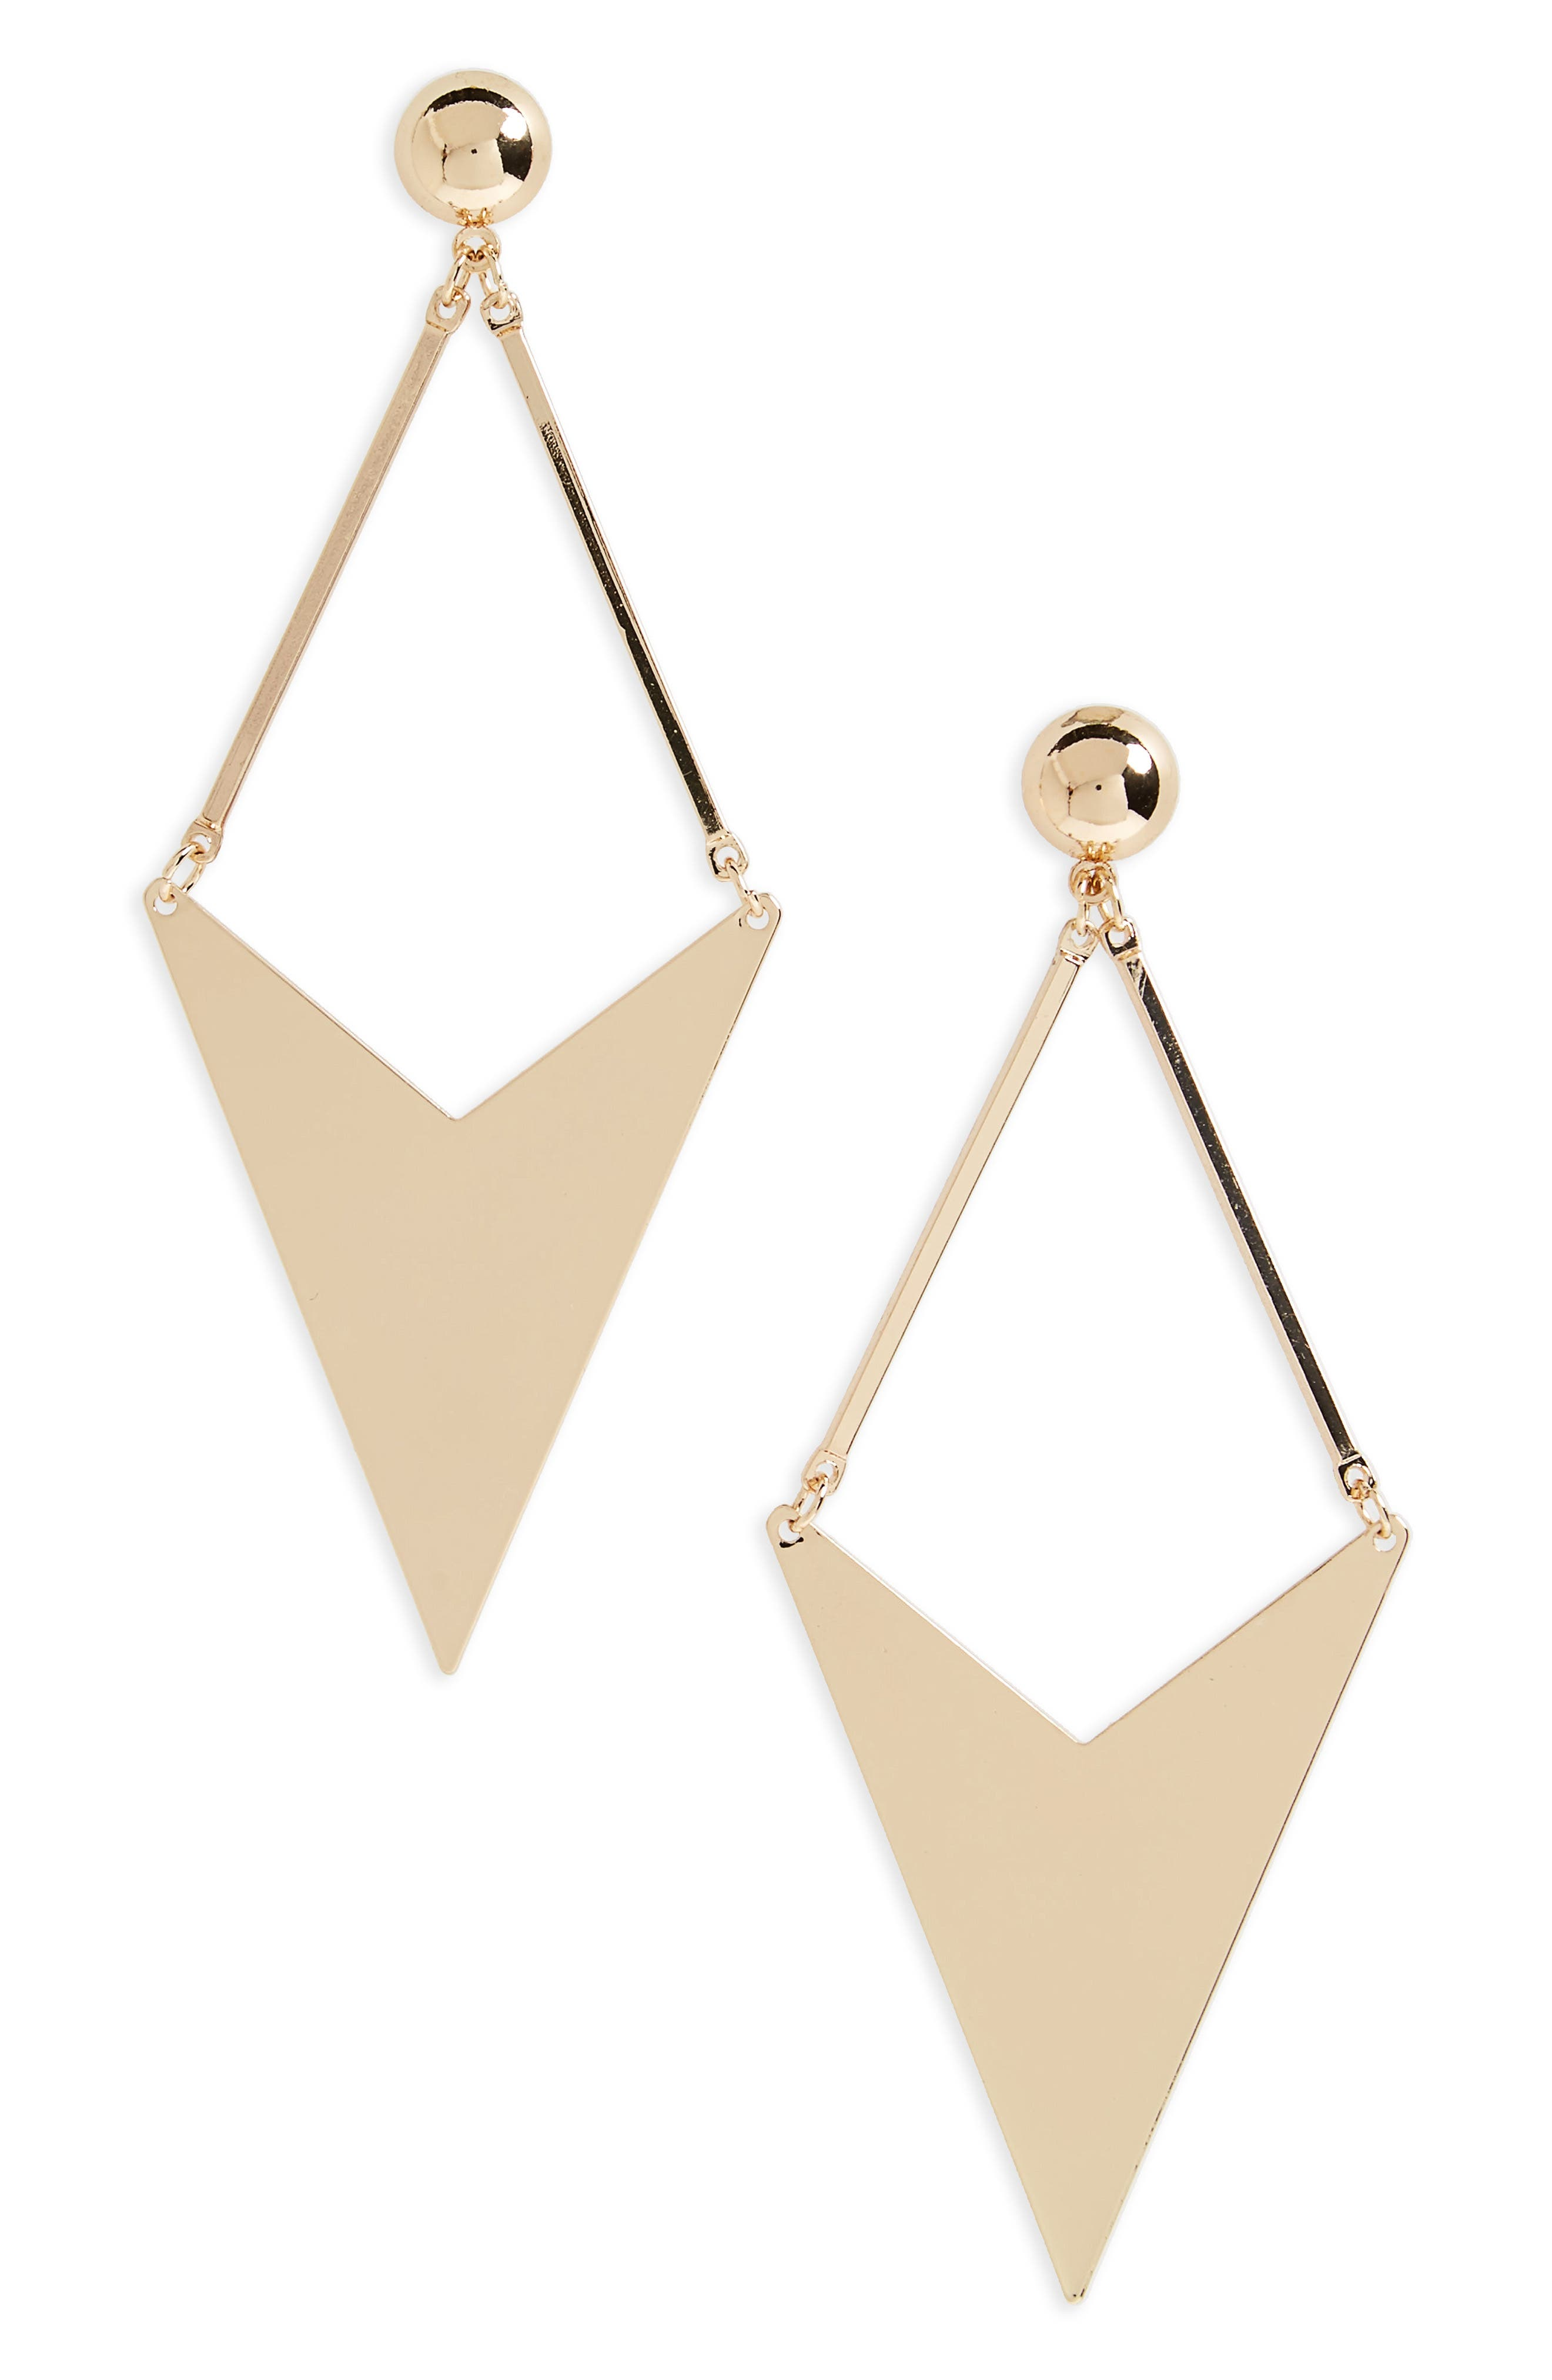 Large Kite Earrings,                         Main,                         color, Gold